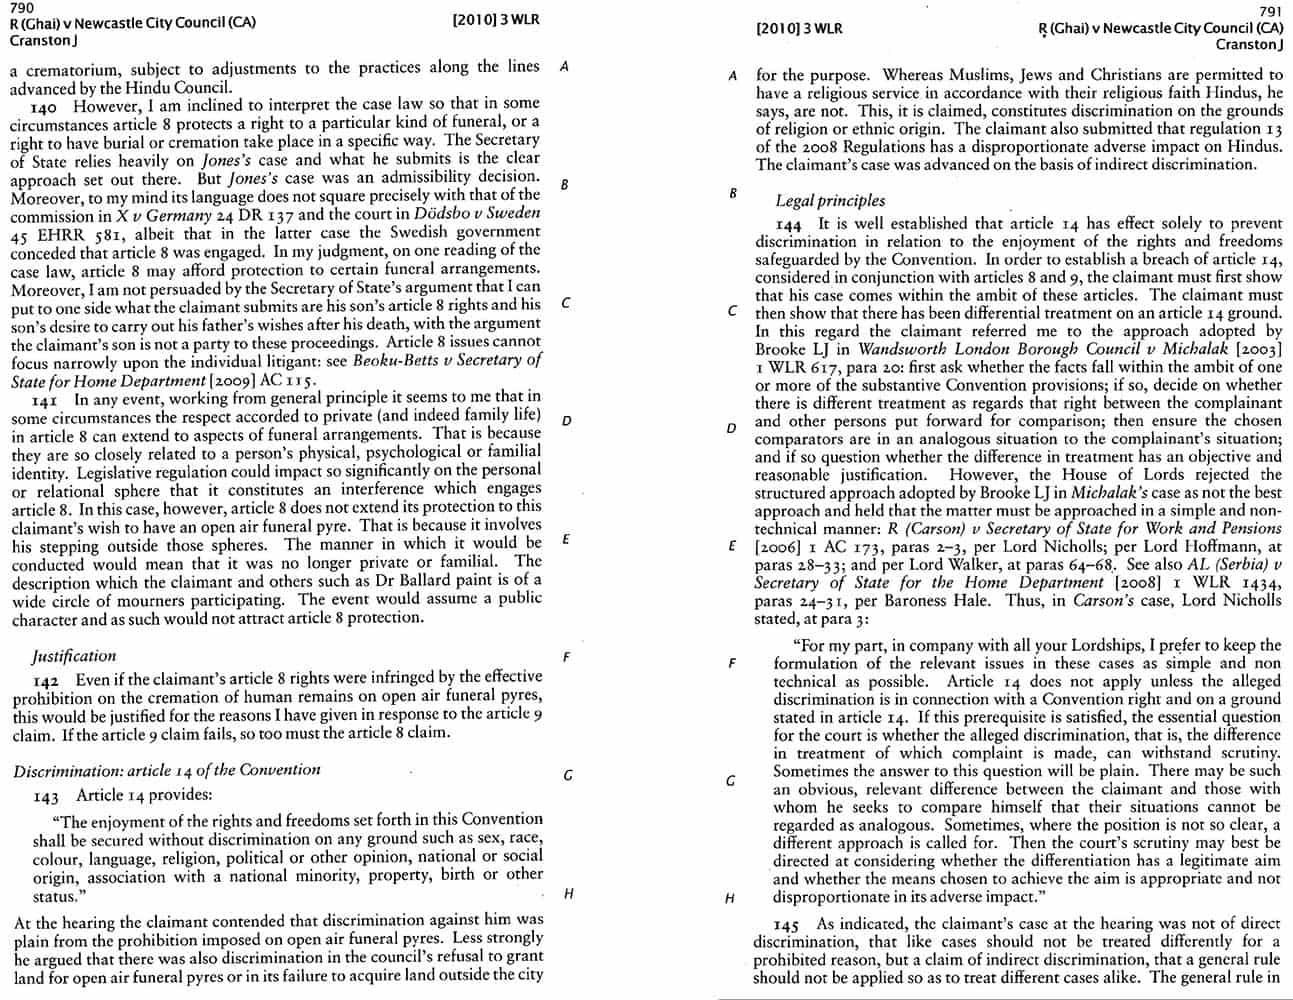 full_legal_verdict-28-min